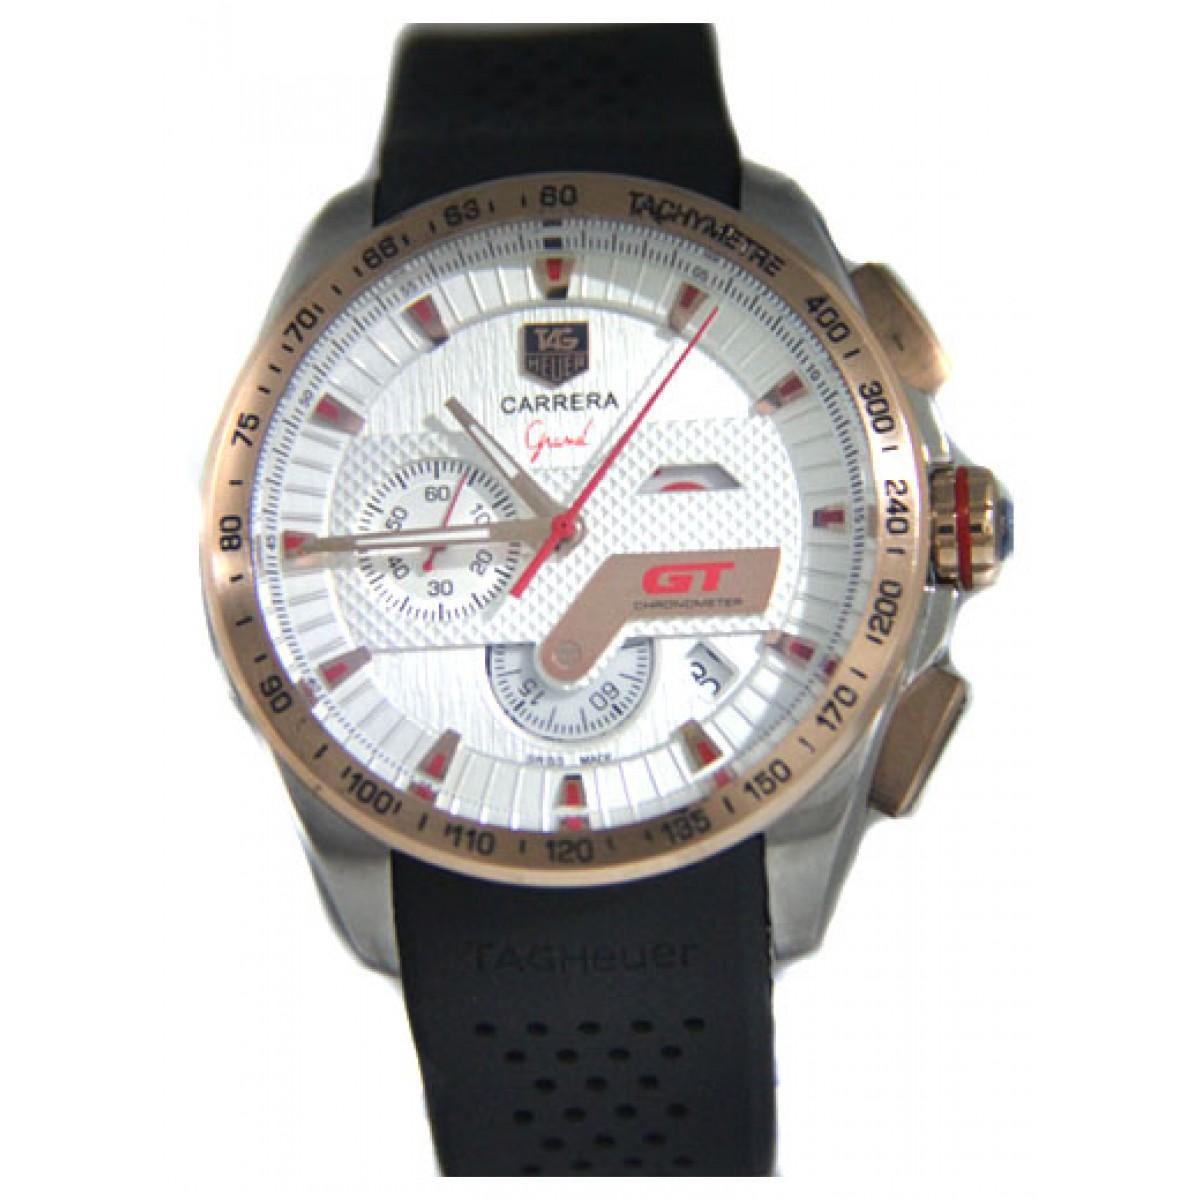 29afa21b881 Espiar · Relógio Réplica Tag Heuer Grand Carrera GT